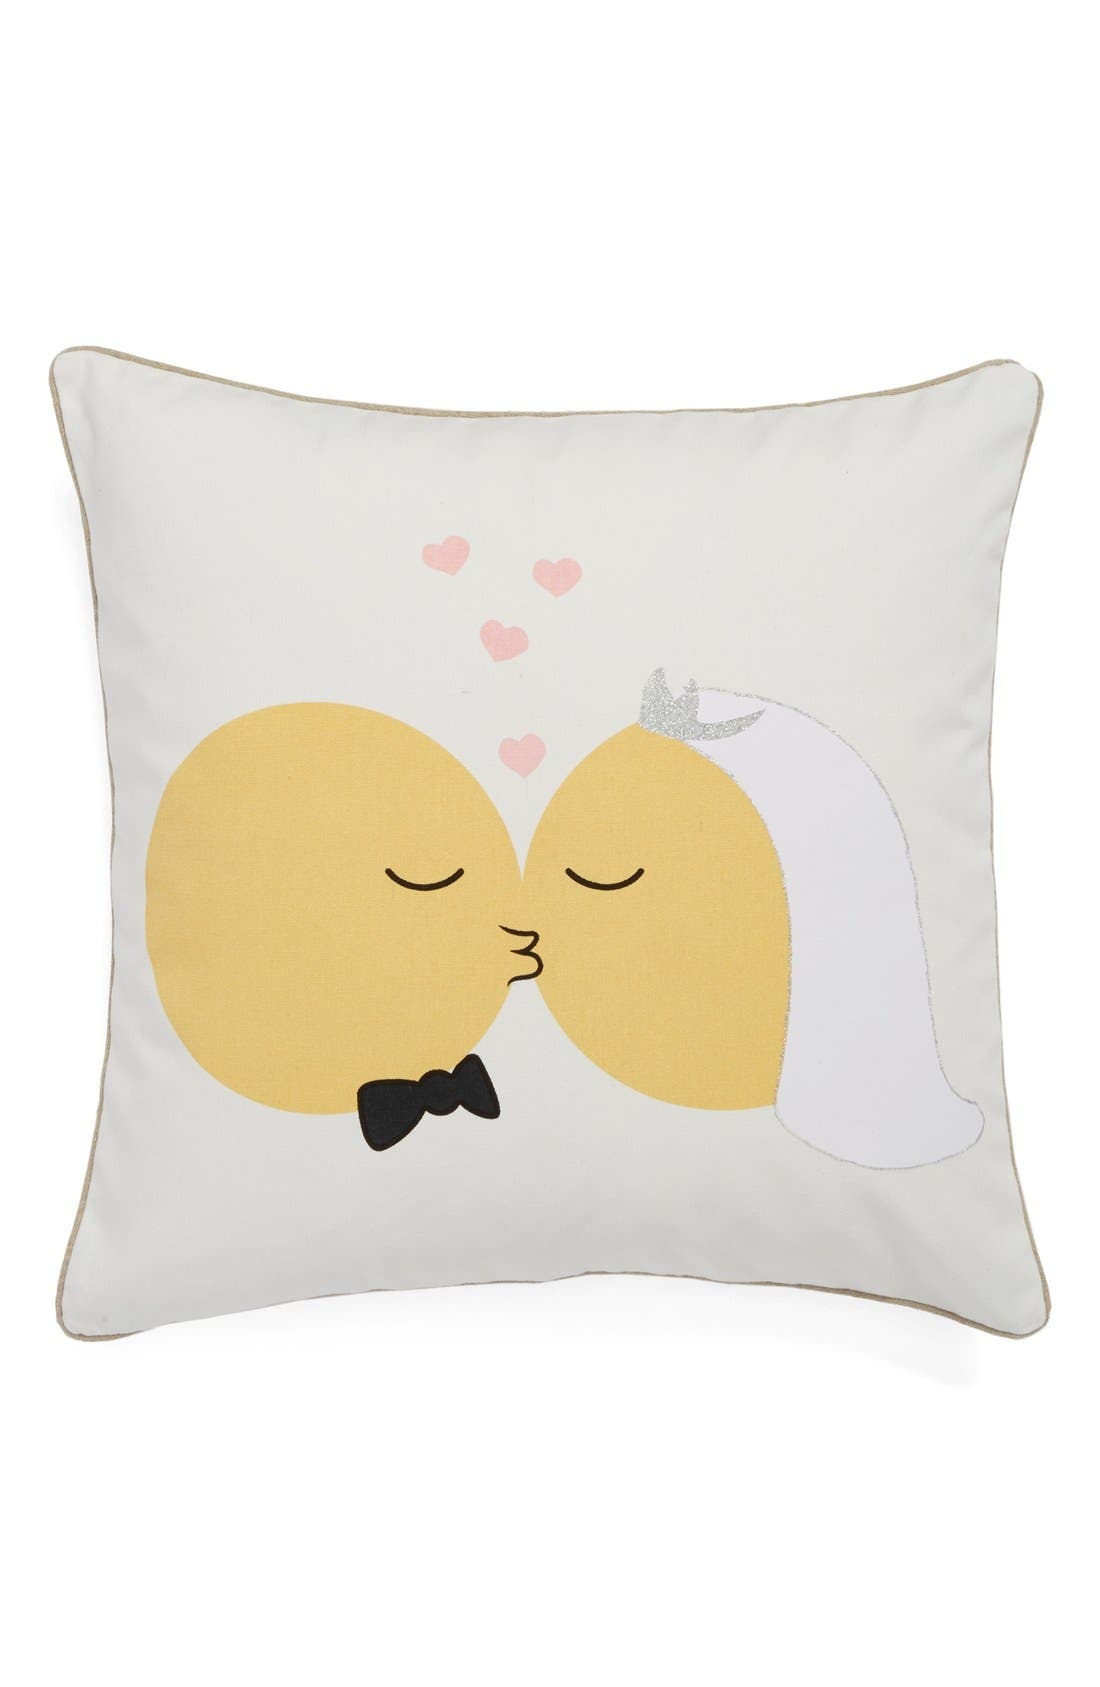 Alternate Image 1 Selected - Levtex 'Married Emoji' Pillow